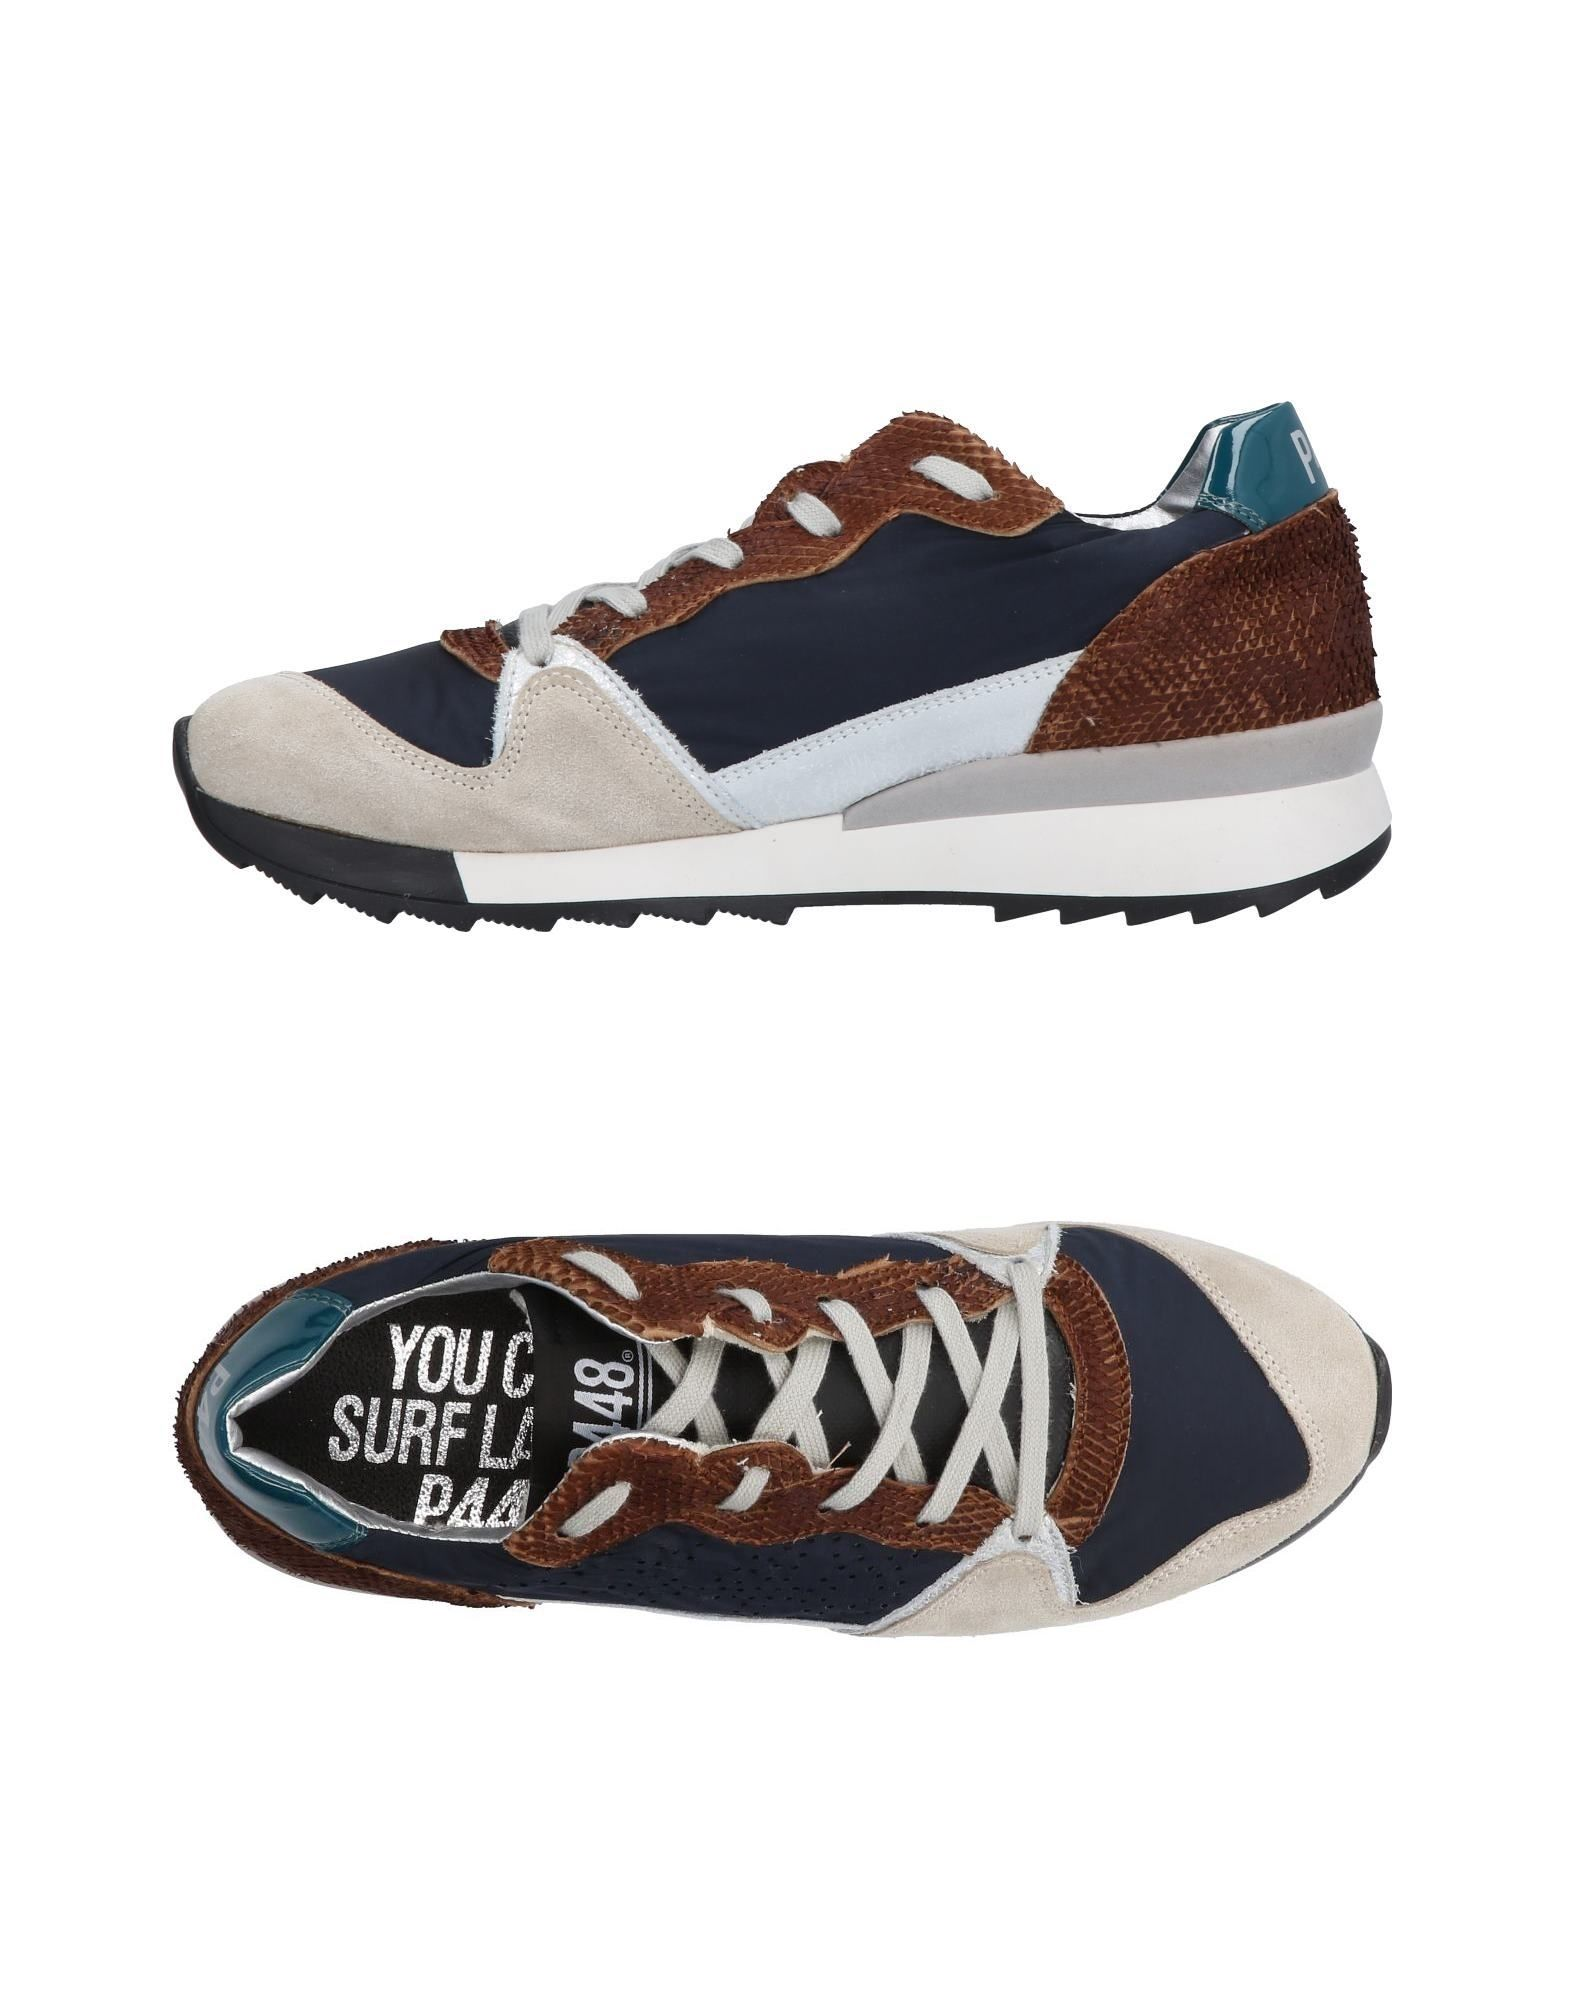 Moda Sneakers P448 Uomo - 11457264TB 11457264TB - 263872